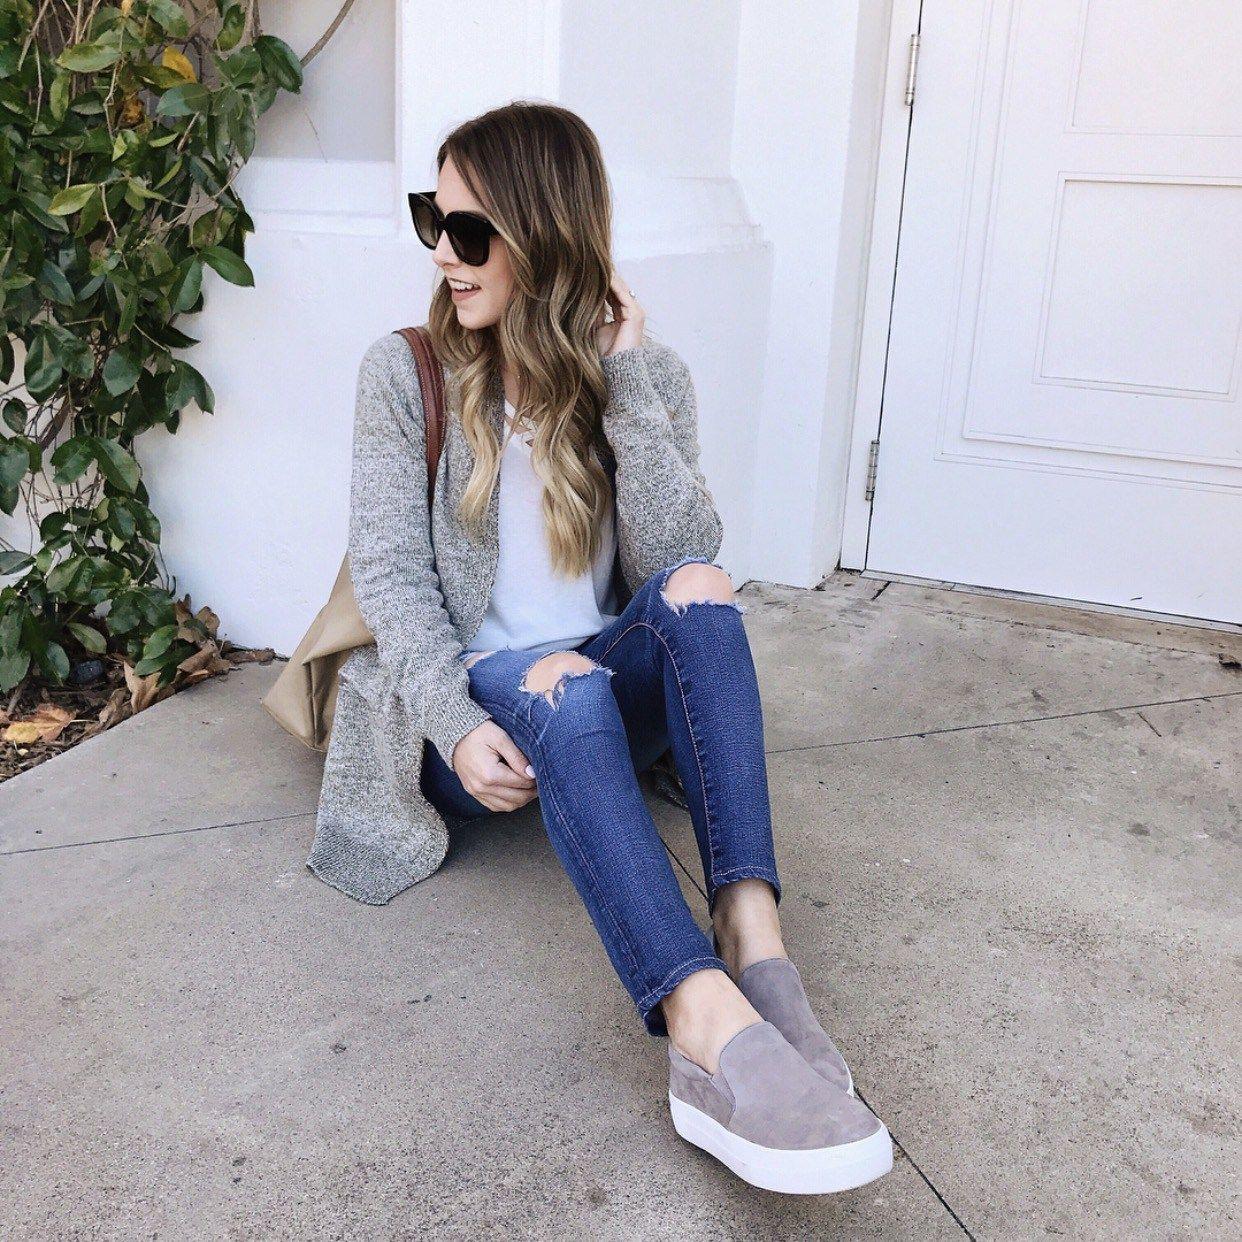 4039c7da8f7 Grey & platform sneakers | Fall in 2019 | Platform sneakers outfit ...